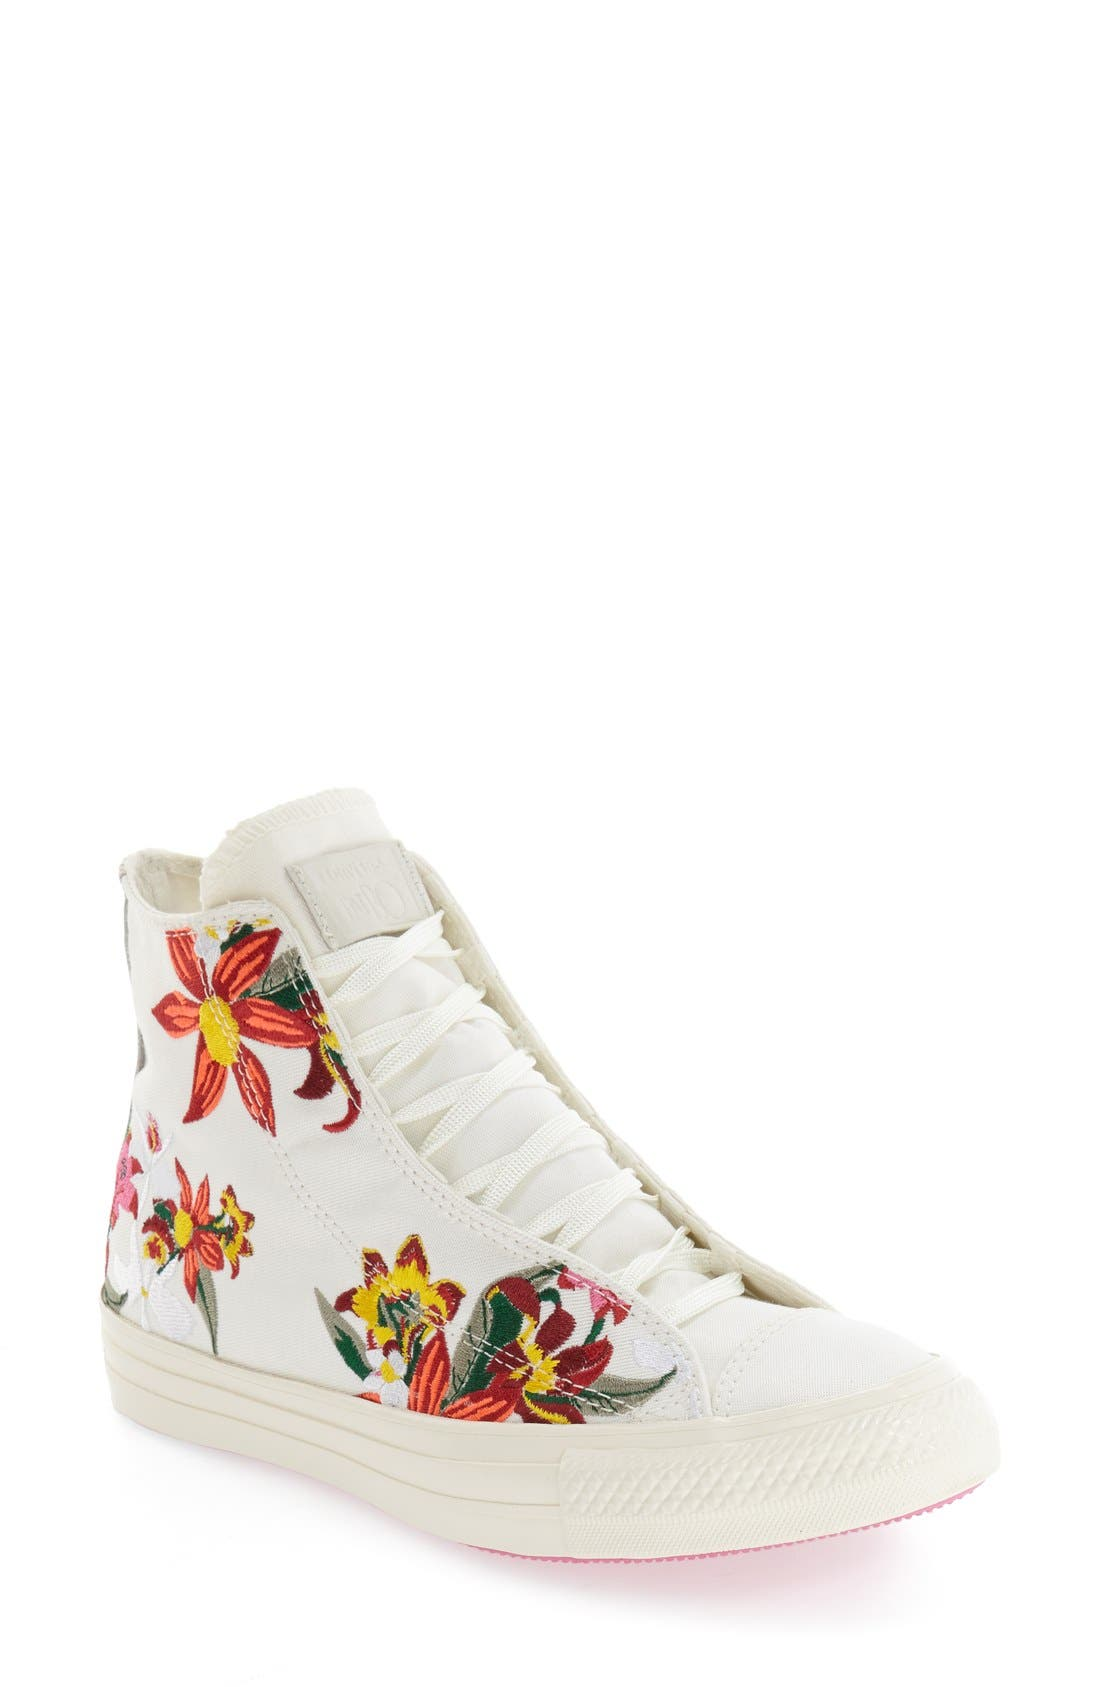 Chuck Taylor<sup>®</sup> All Star<sup>®</sup> 'Patbo' Floral High Top Sneaker,                             Main thumbnail 1, color,                             100